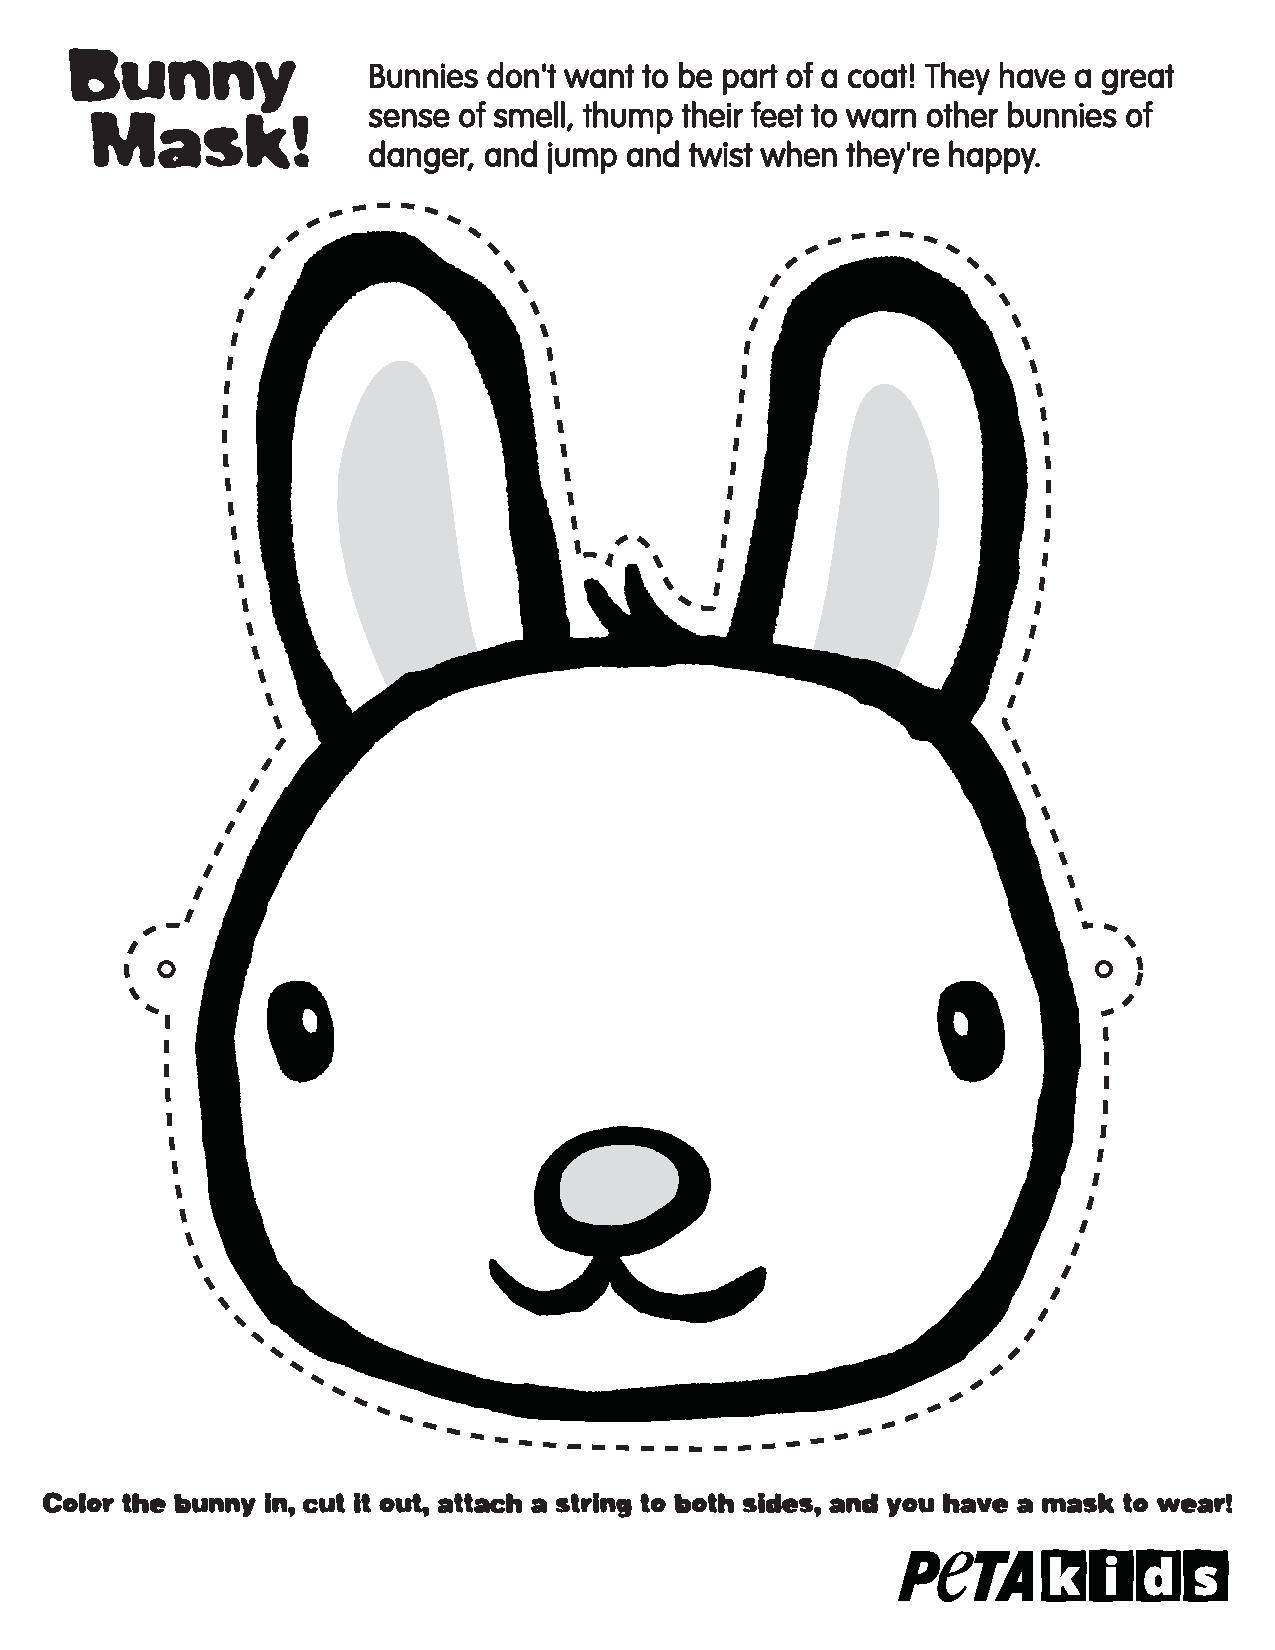 PETA Kids Bunny Mask